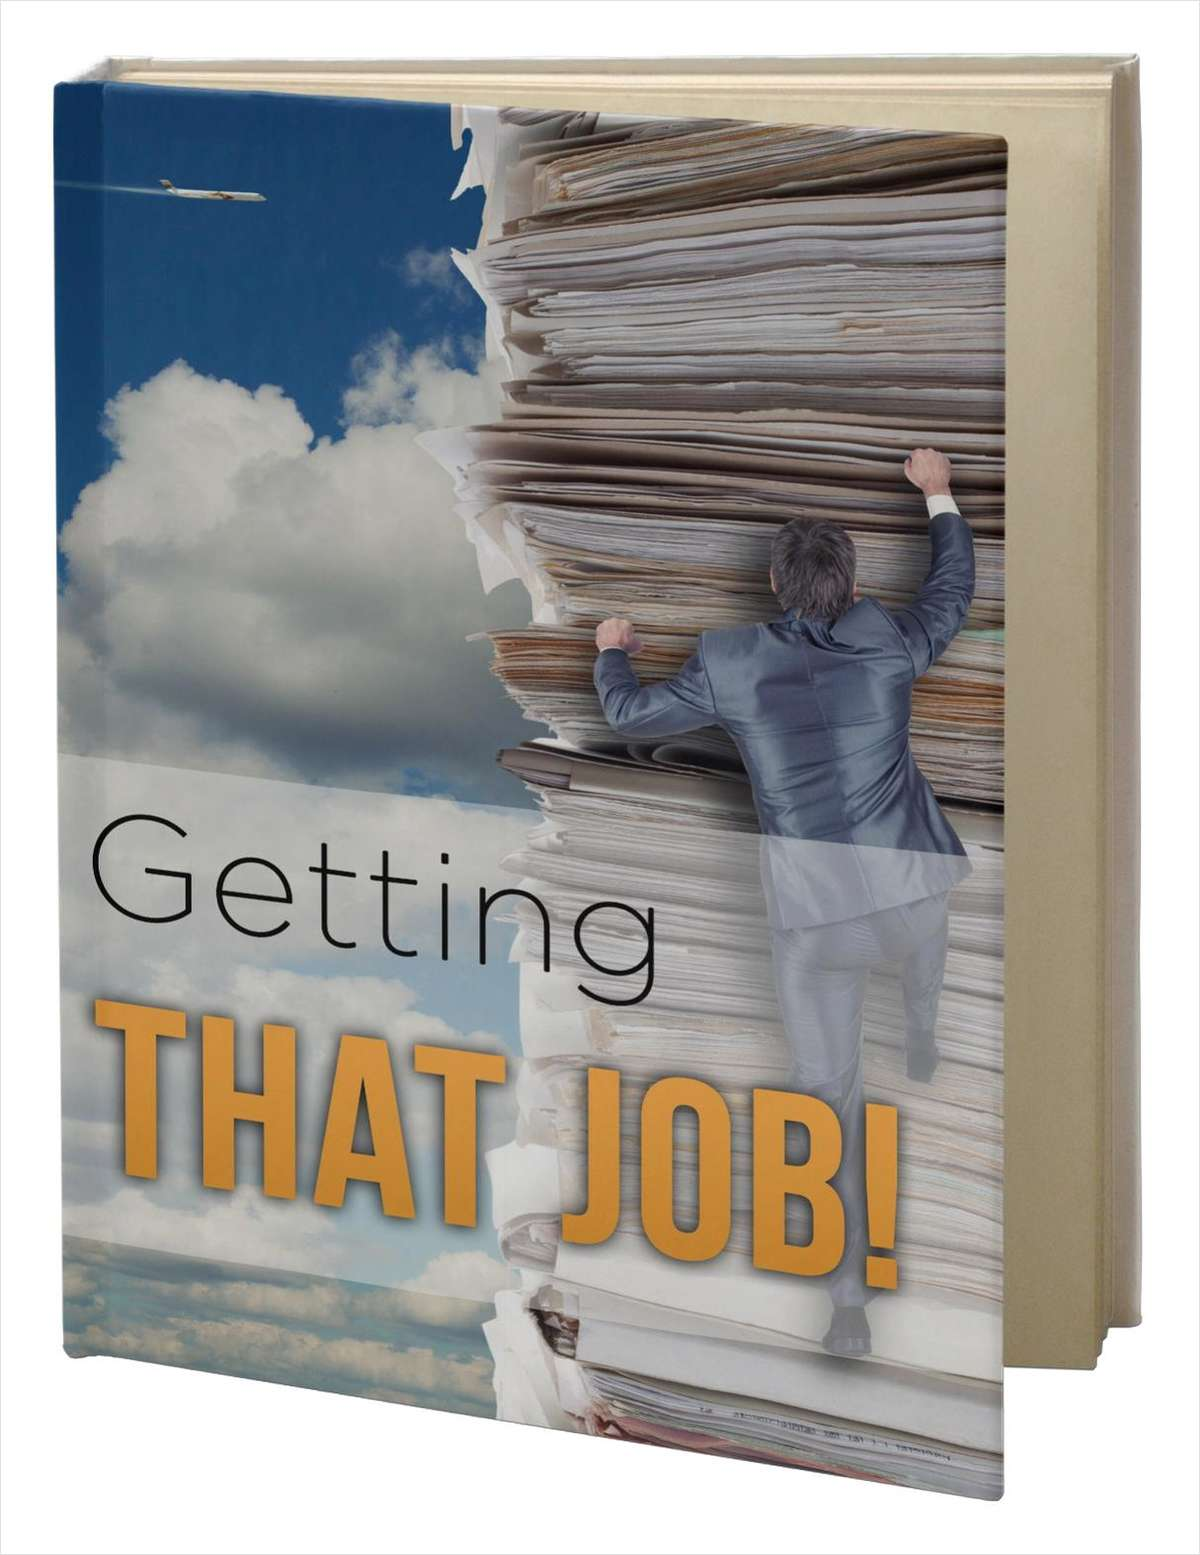 Getting That Job!